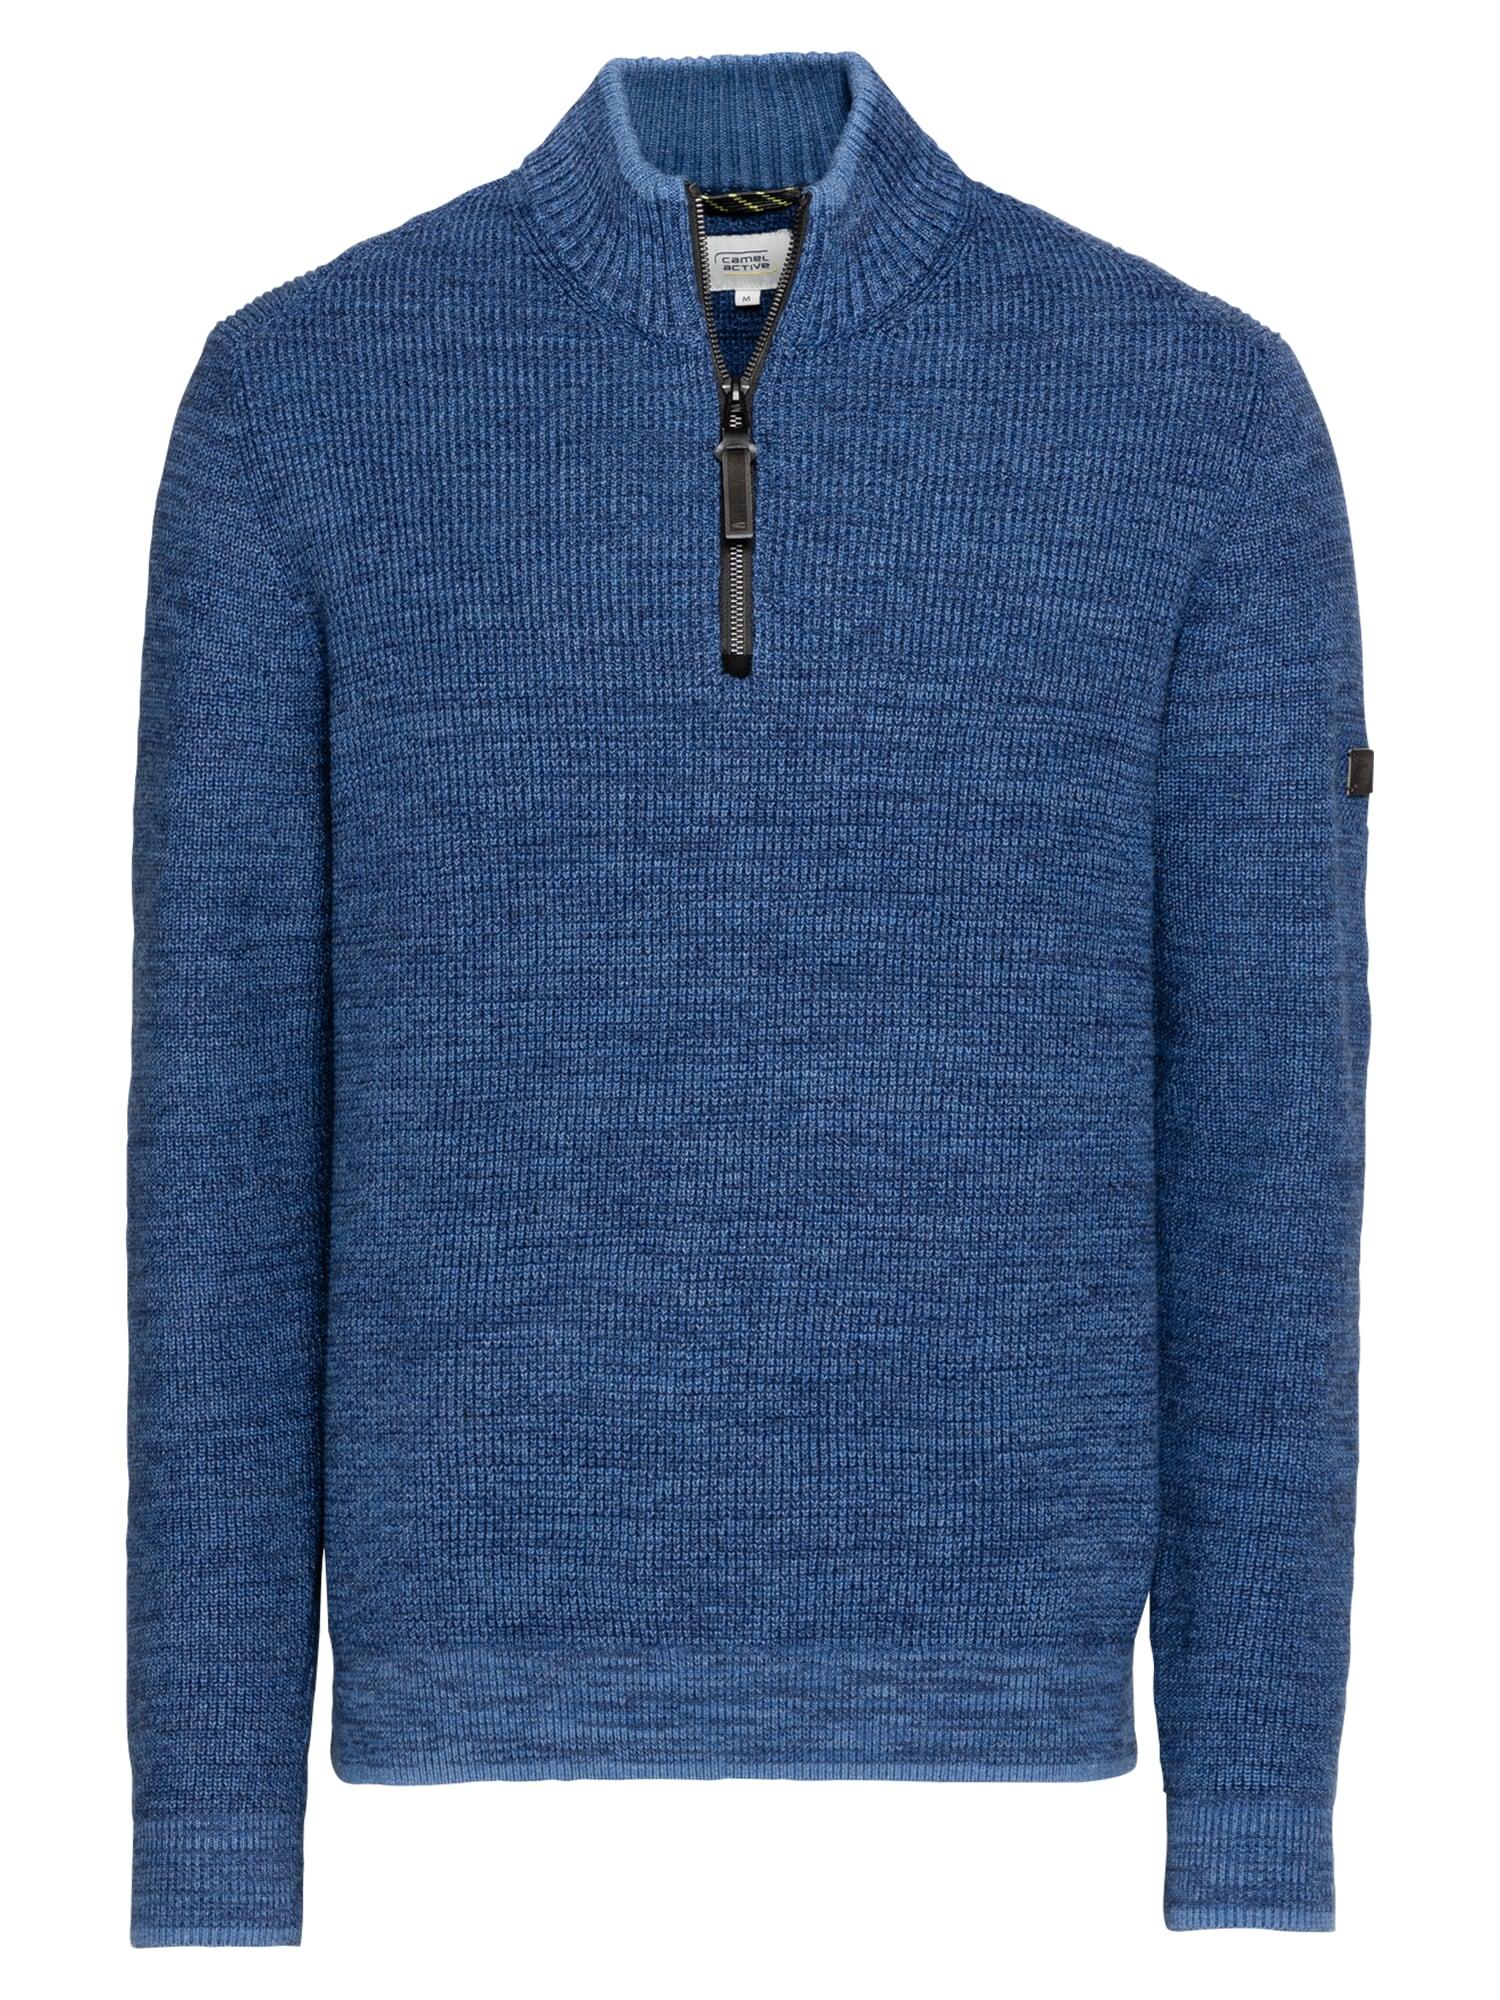 CAMEL ACTIVE Megztinis mėlyna